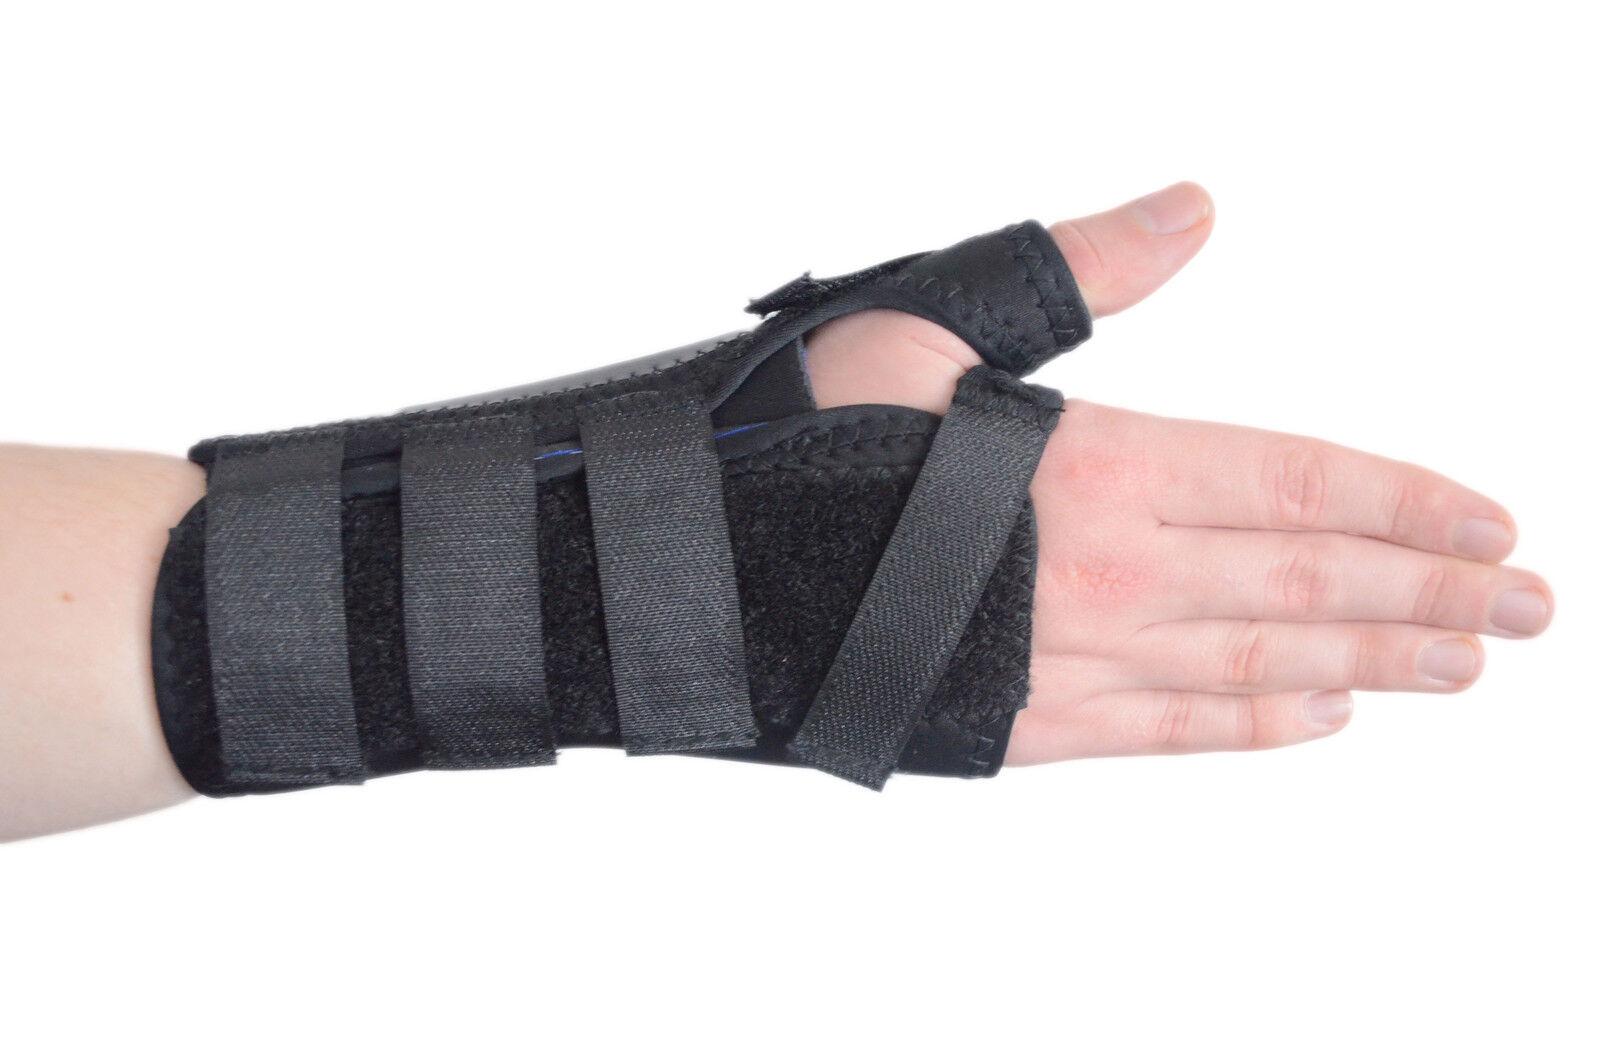 thumb + arthritis + brace jpg 422x640